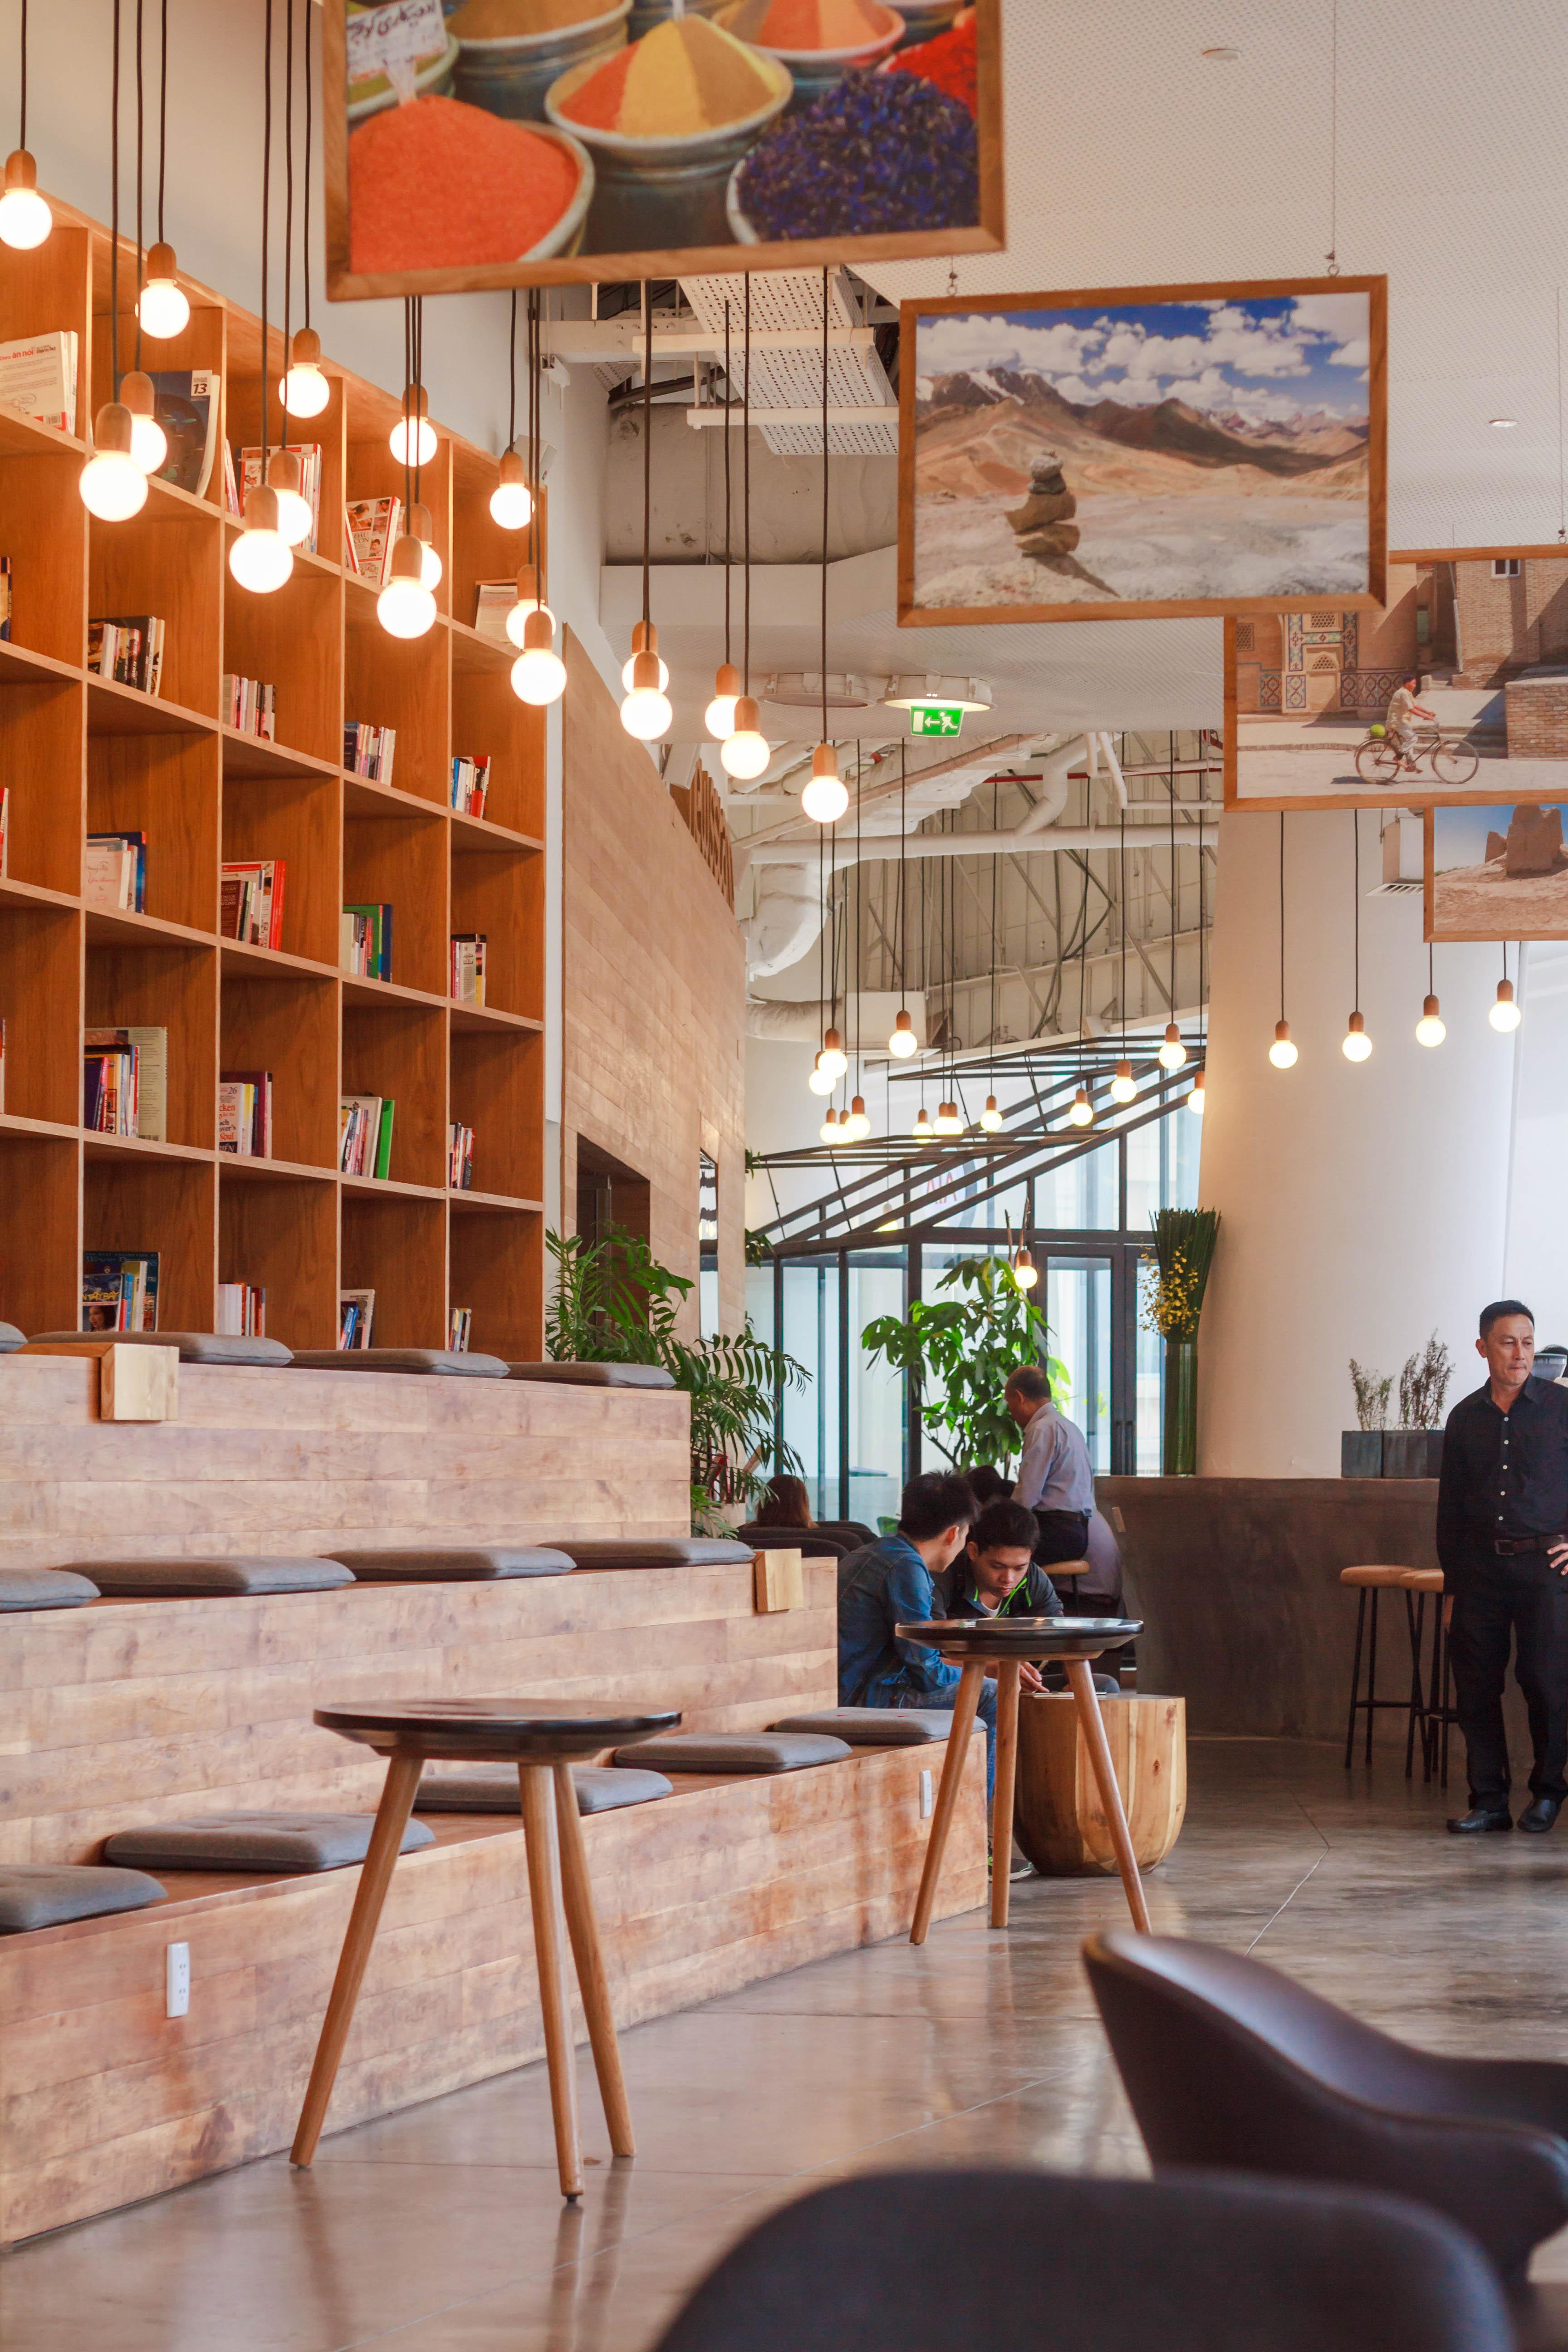 Interior Of The Restaurant Free Stock Photo